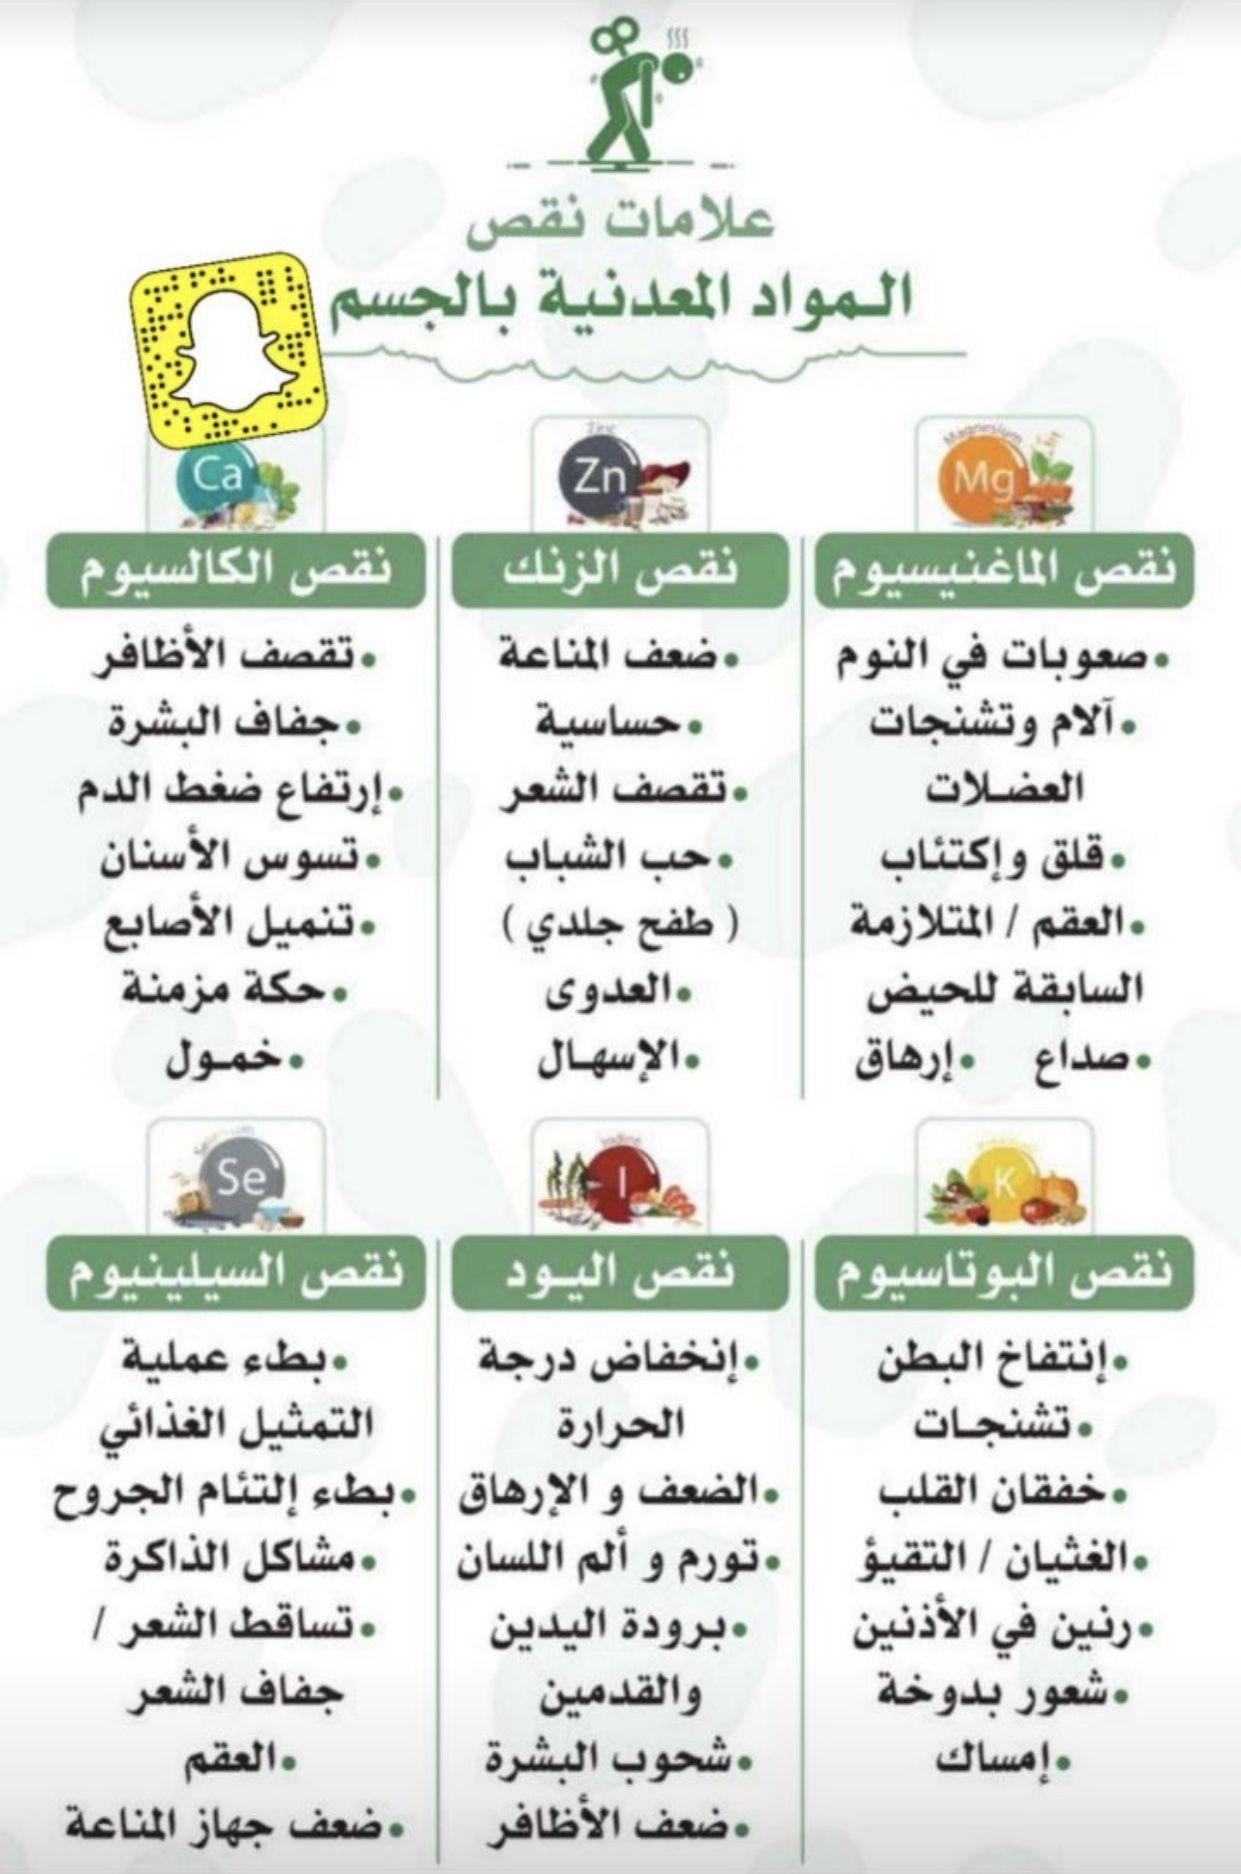 Pin By Samar Anan On Health Health Fitness Food Health Facts Food Health Facts